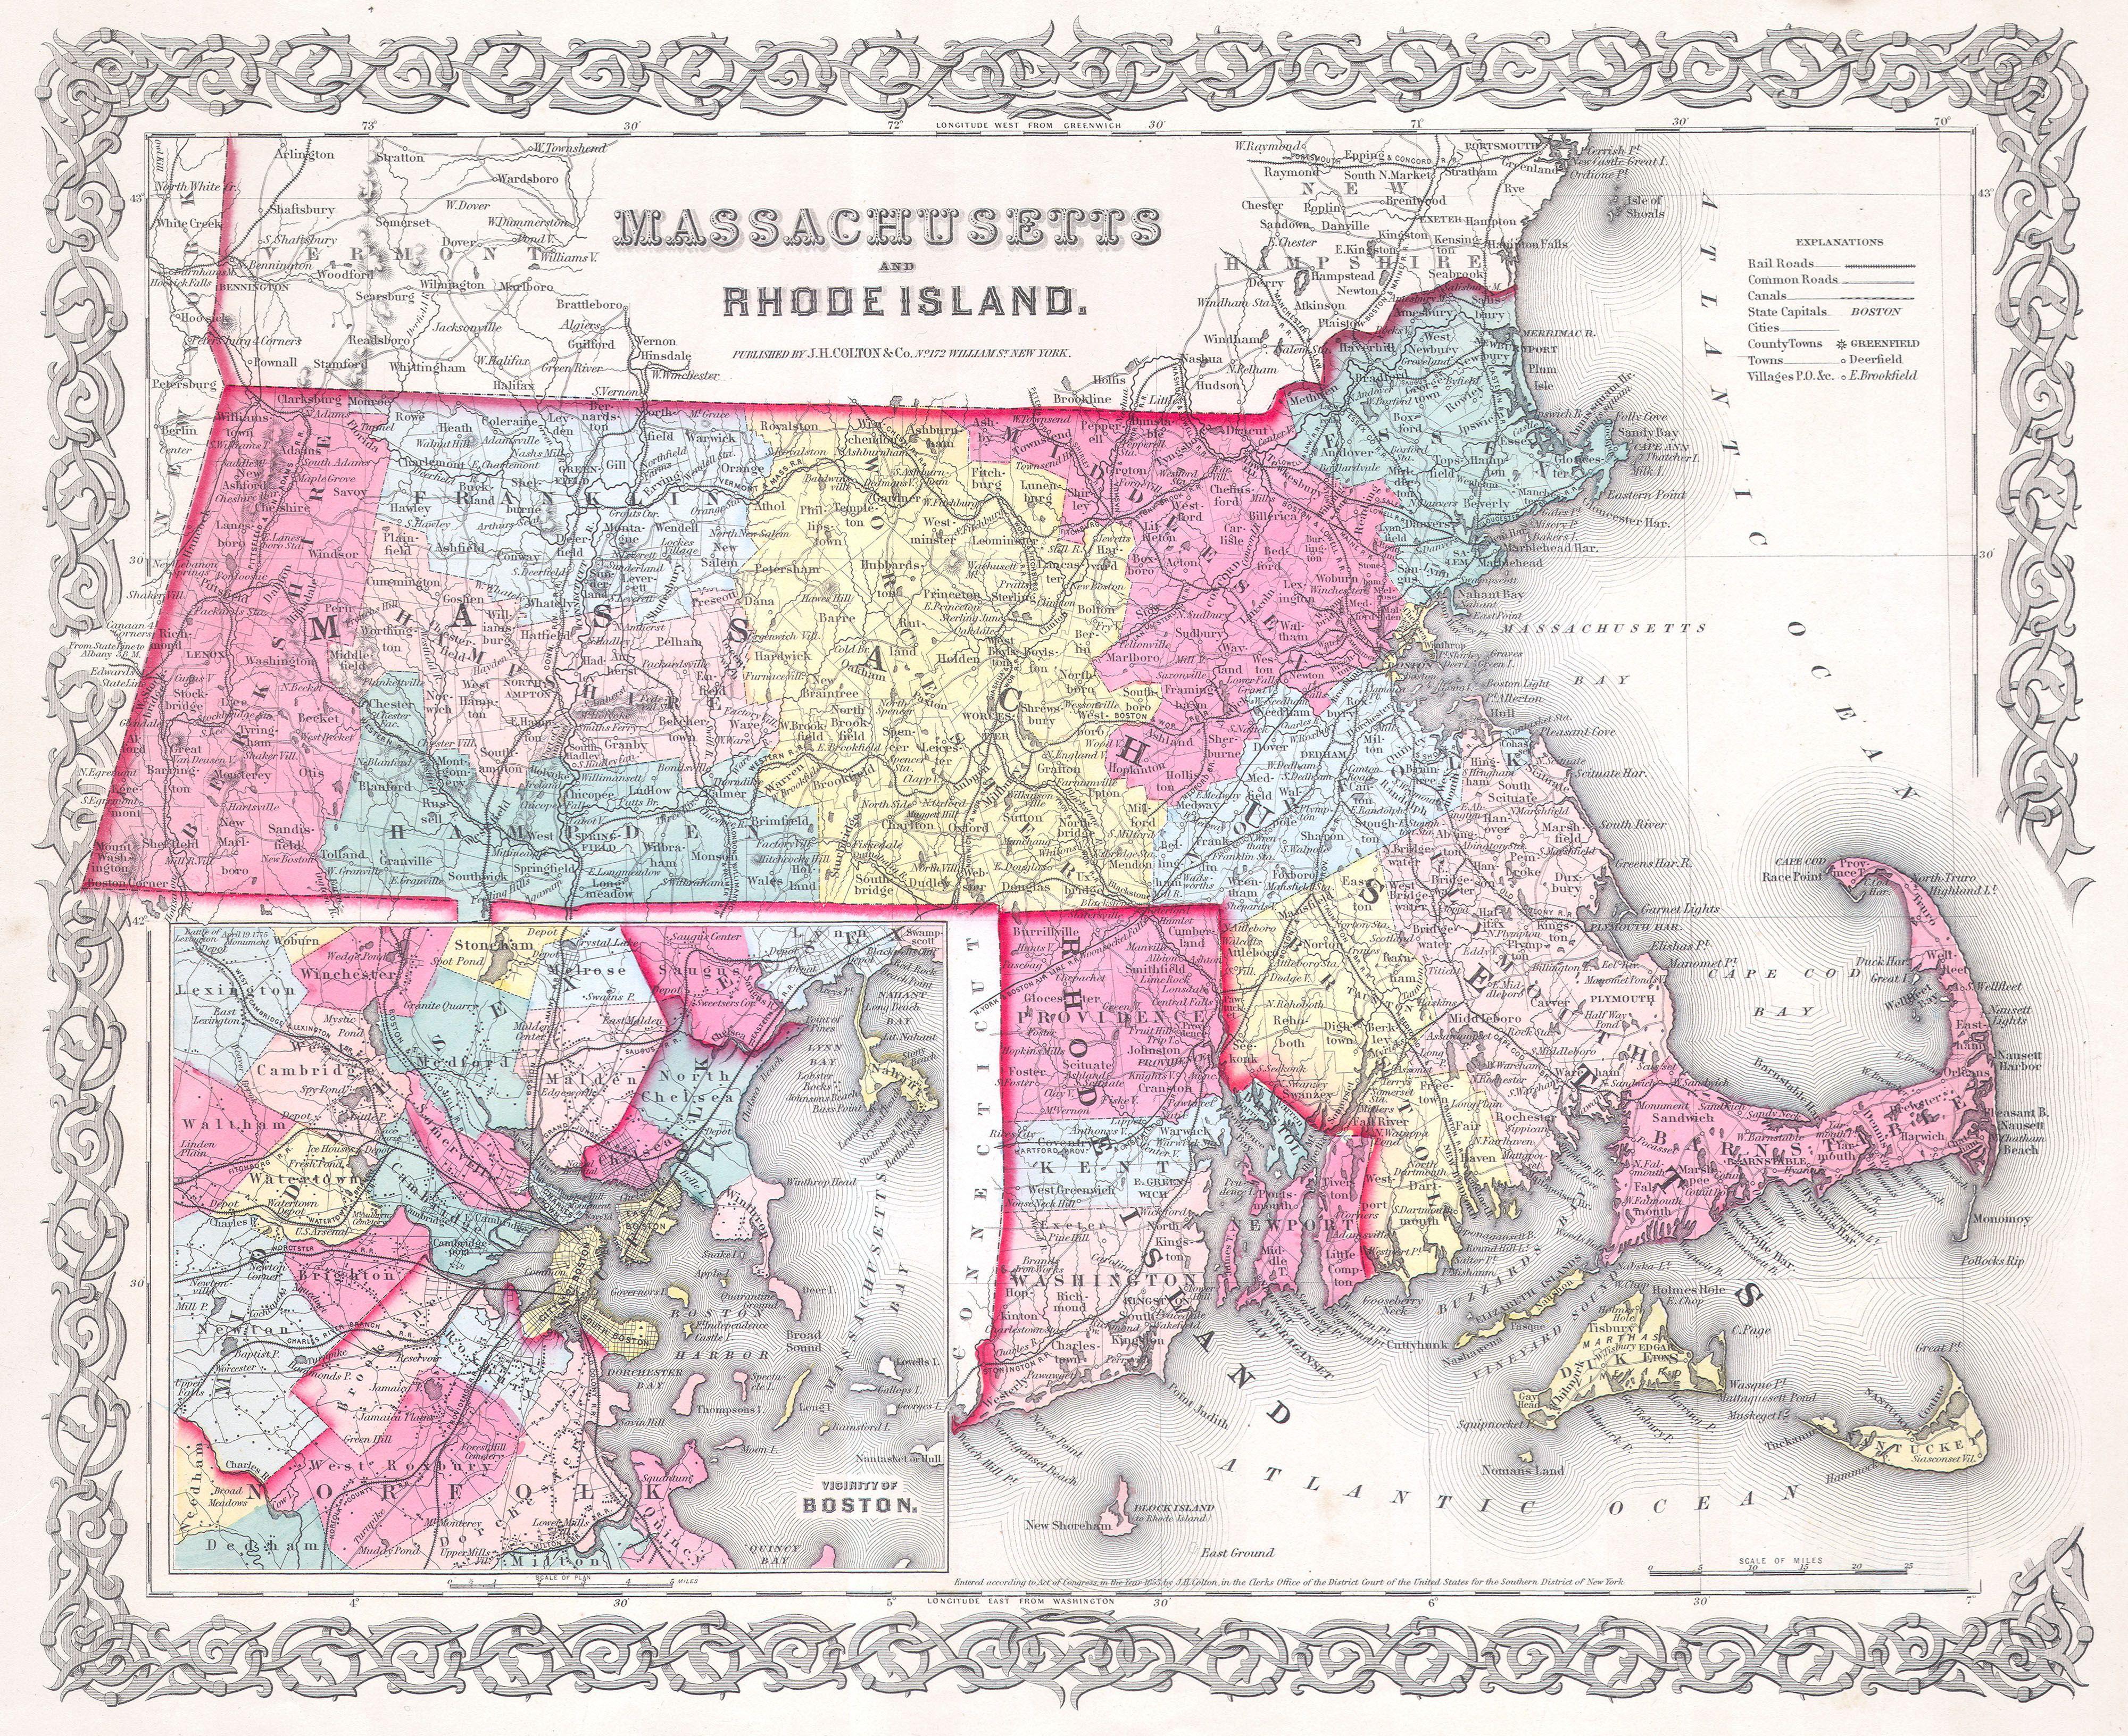 Map Of Massachusetts And Rhode Island File:1855 Colton Map of Massachusetts and Rhode Island